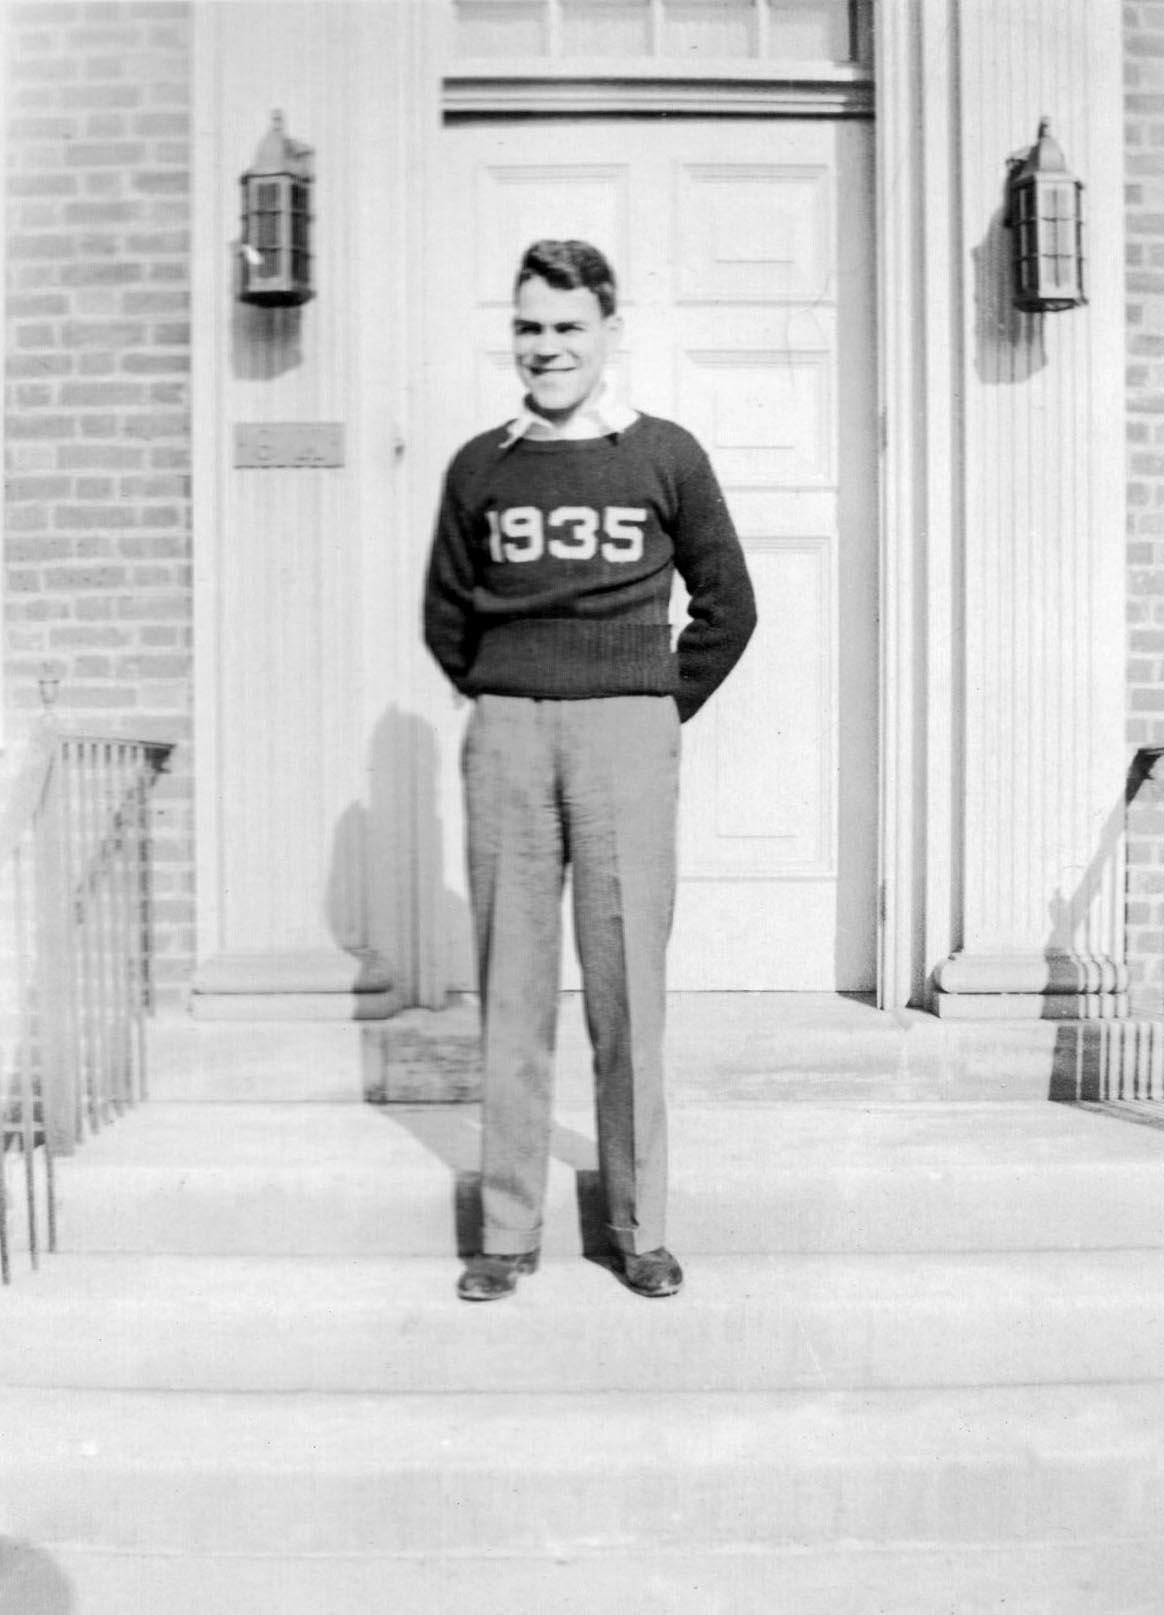 Joseph S. Alexander 1935